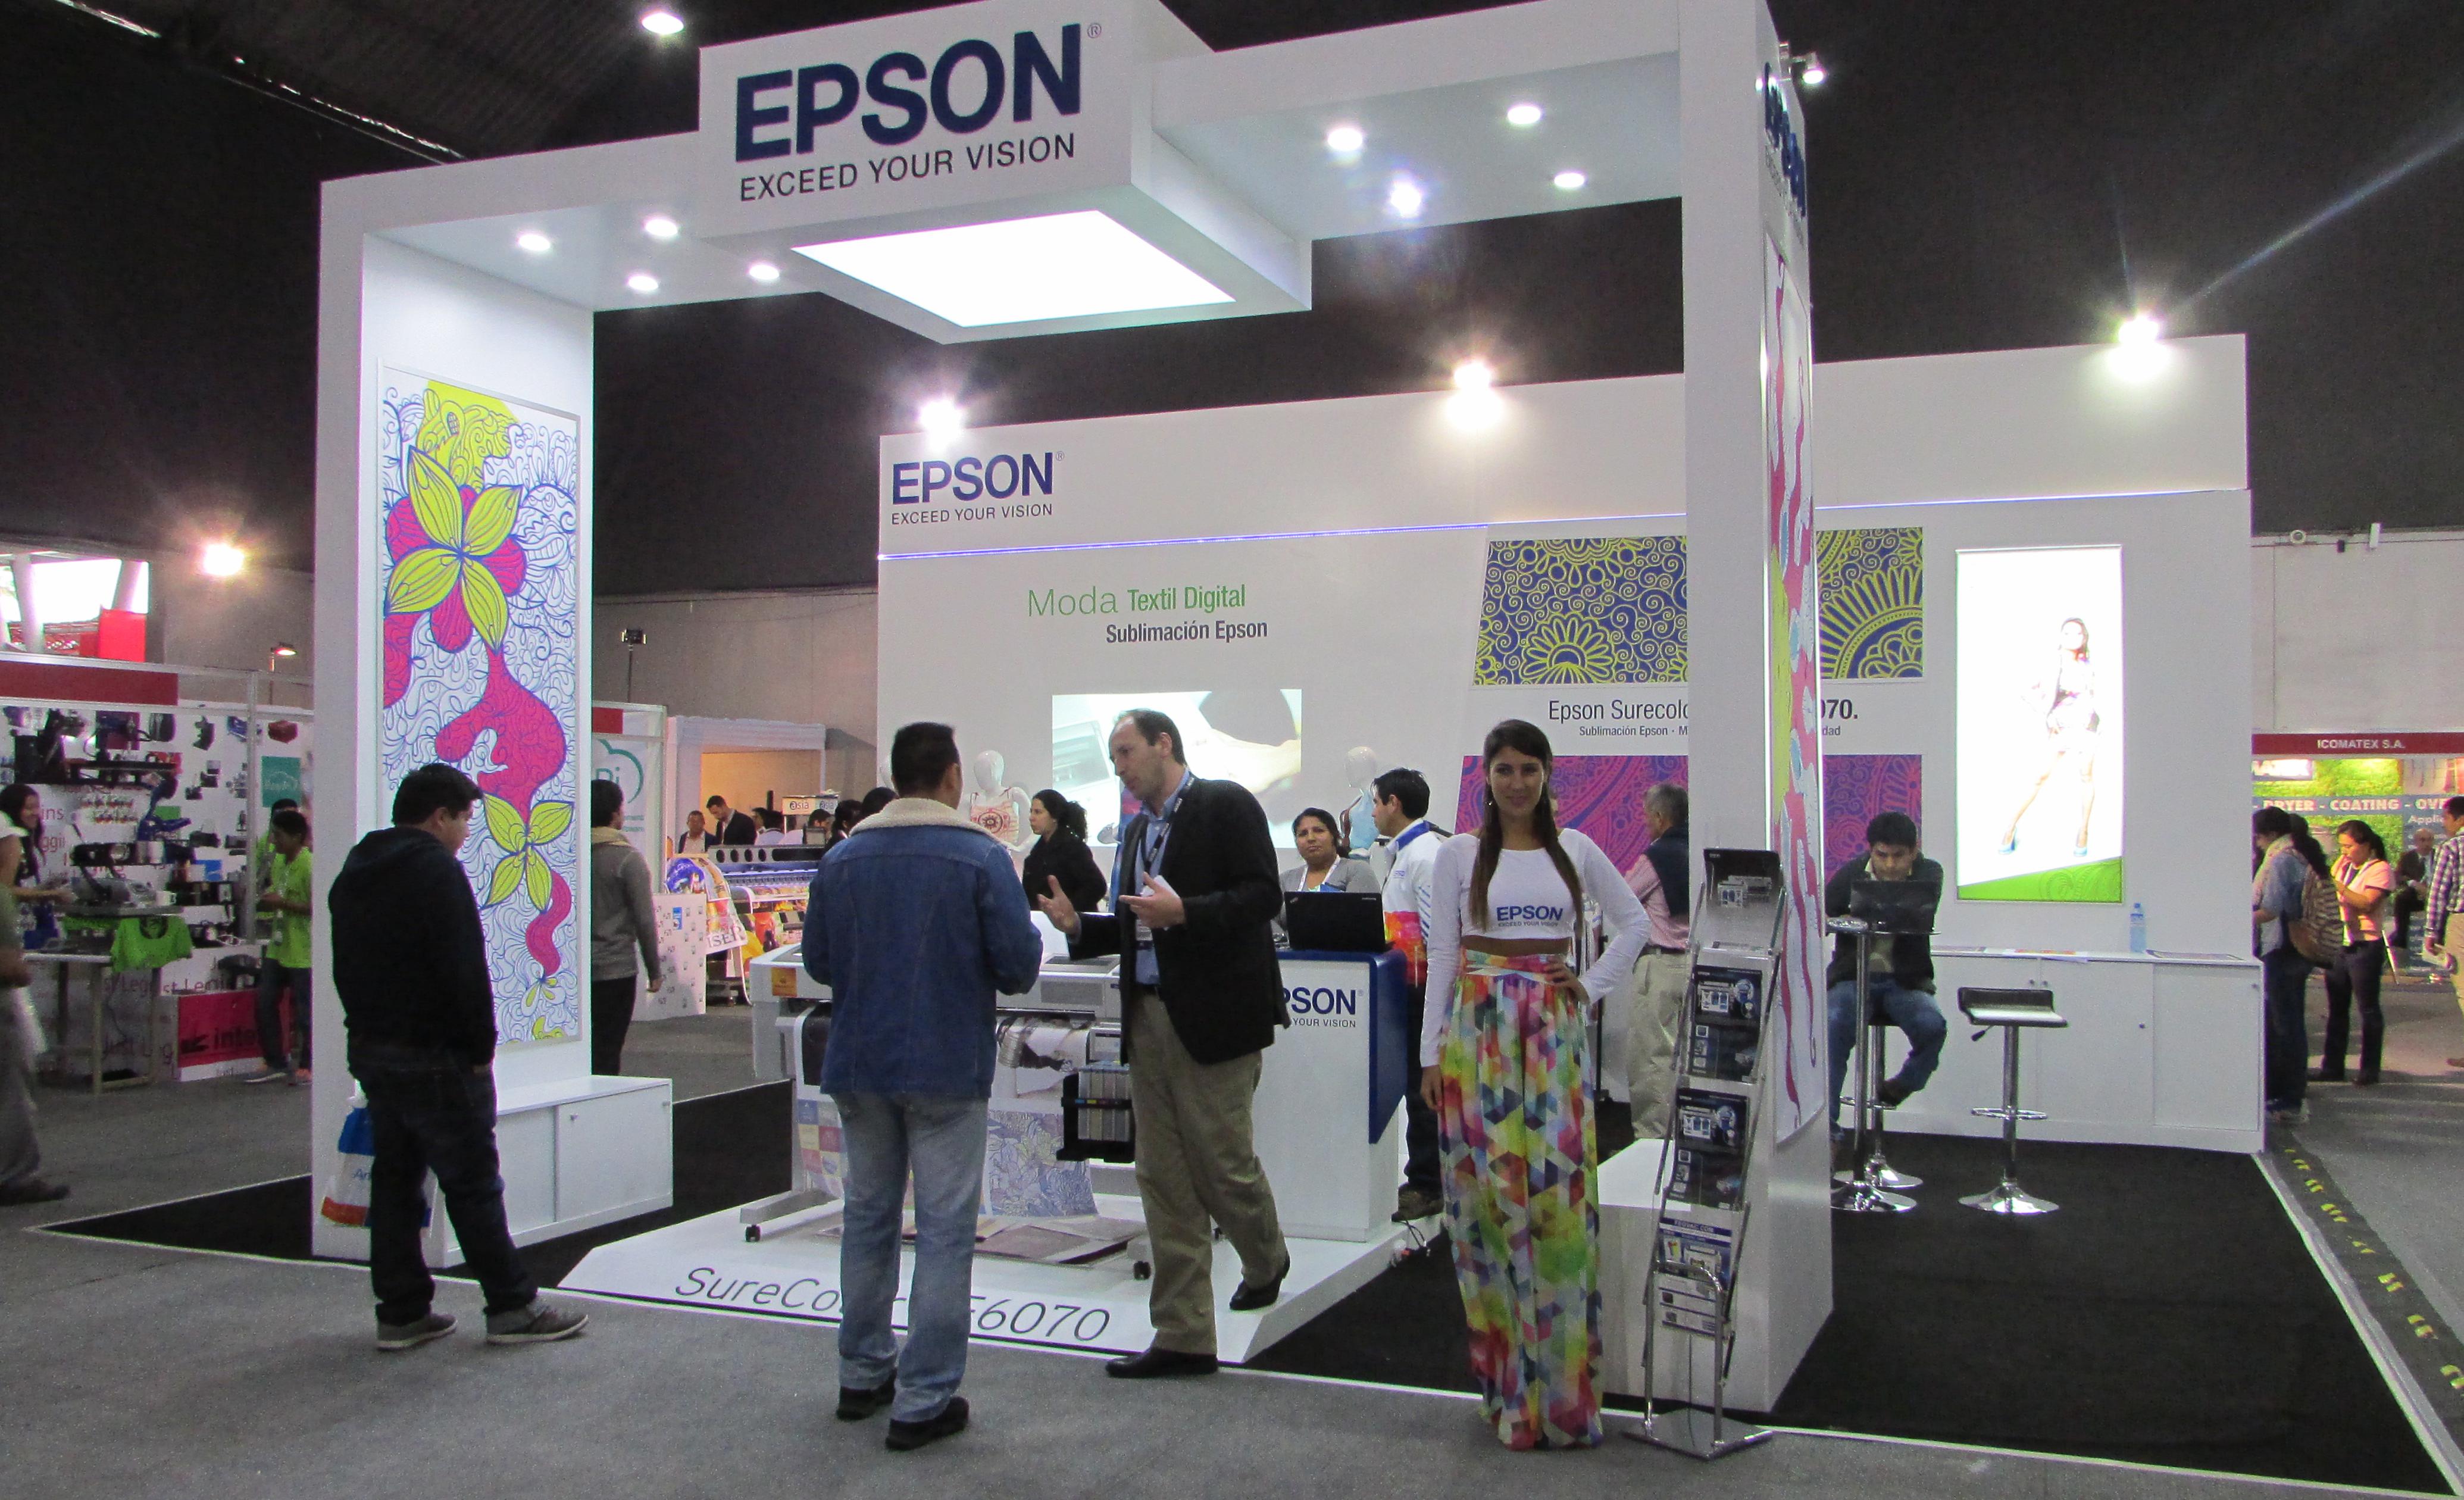 EPSON revoluciona mundo de la moda con impresión textil